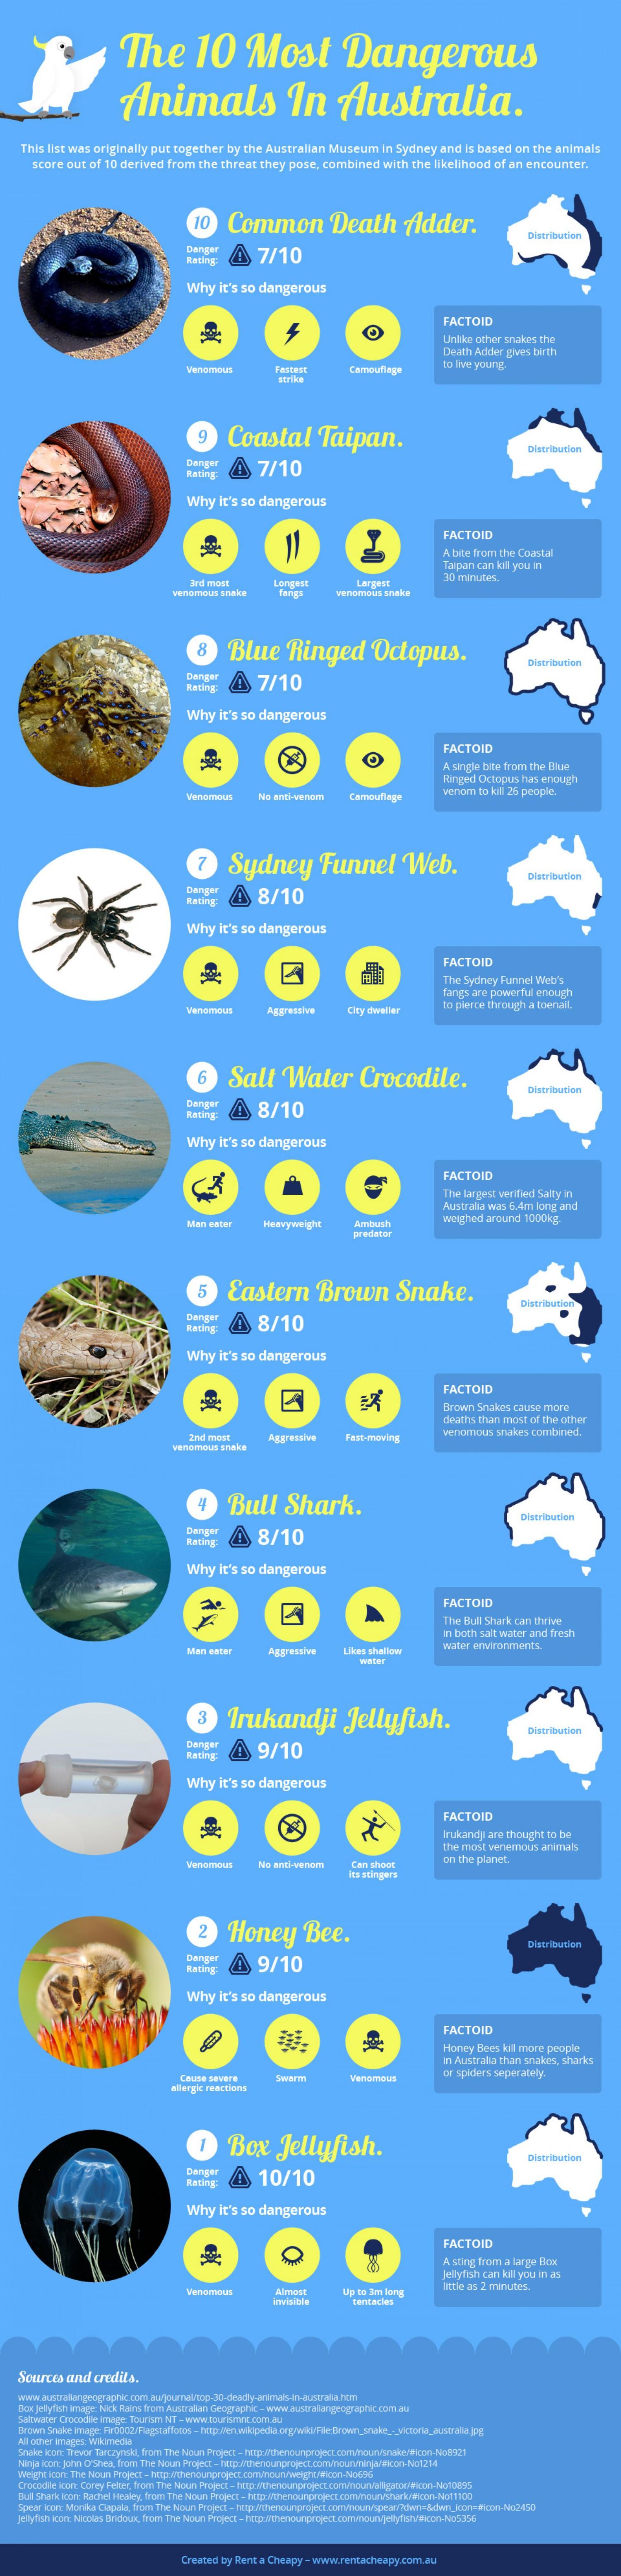 15. The 10 most dangerous animals in Australia